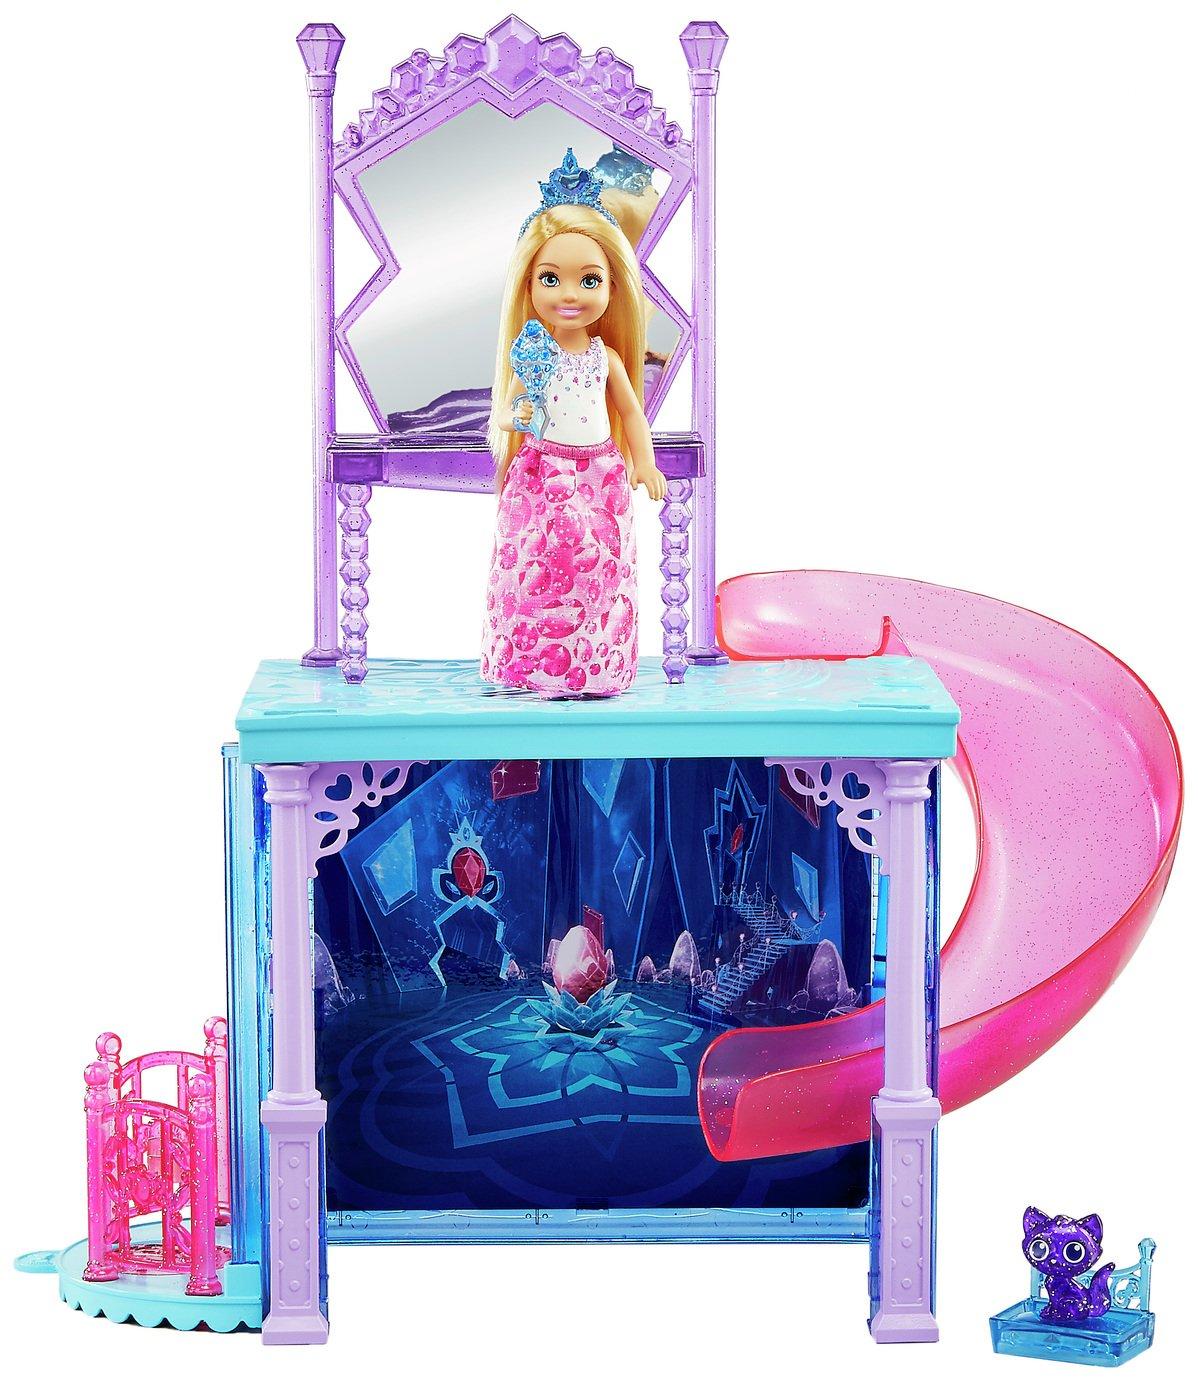 Chelsea Dreamtopia Vanity Playset